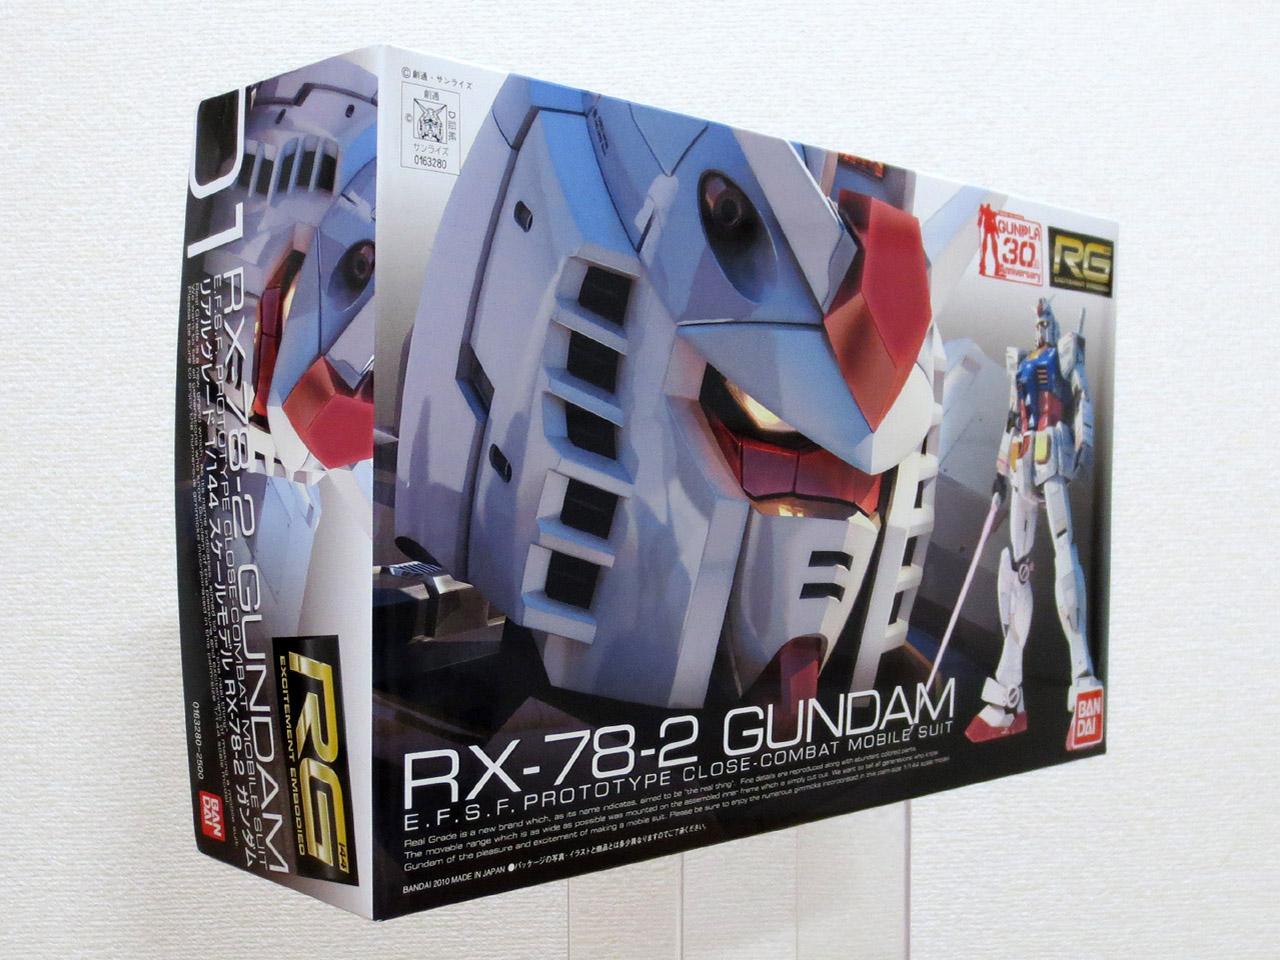 RG_RX78_2_Gundam_01.jpg